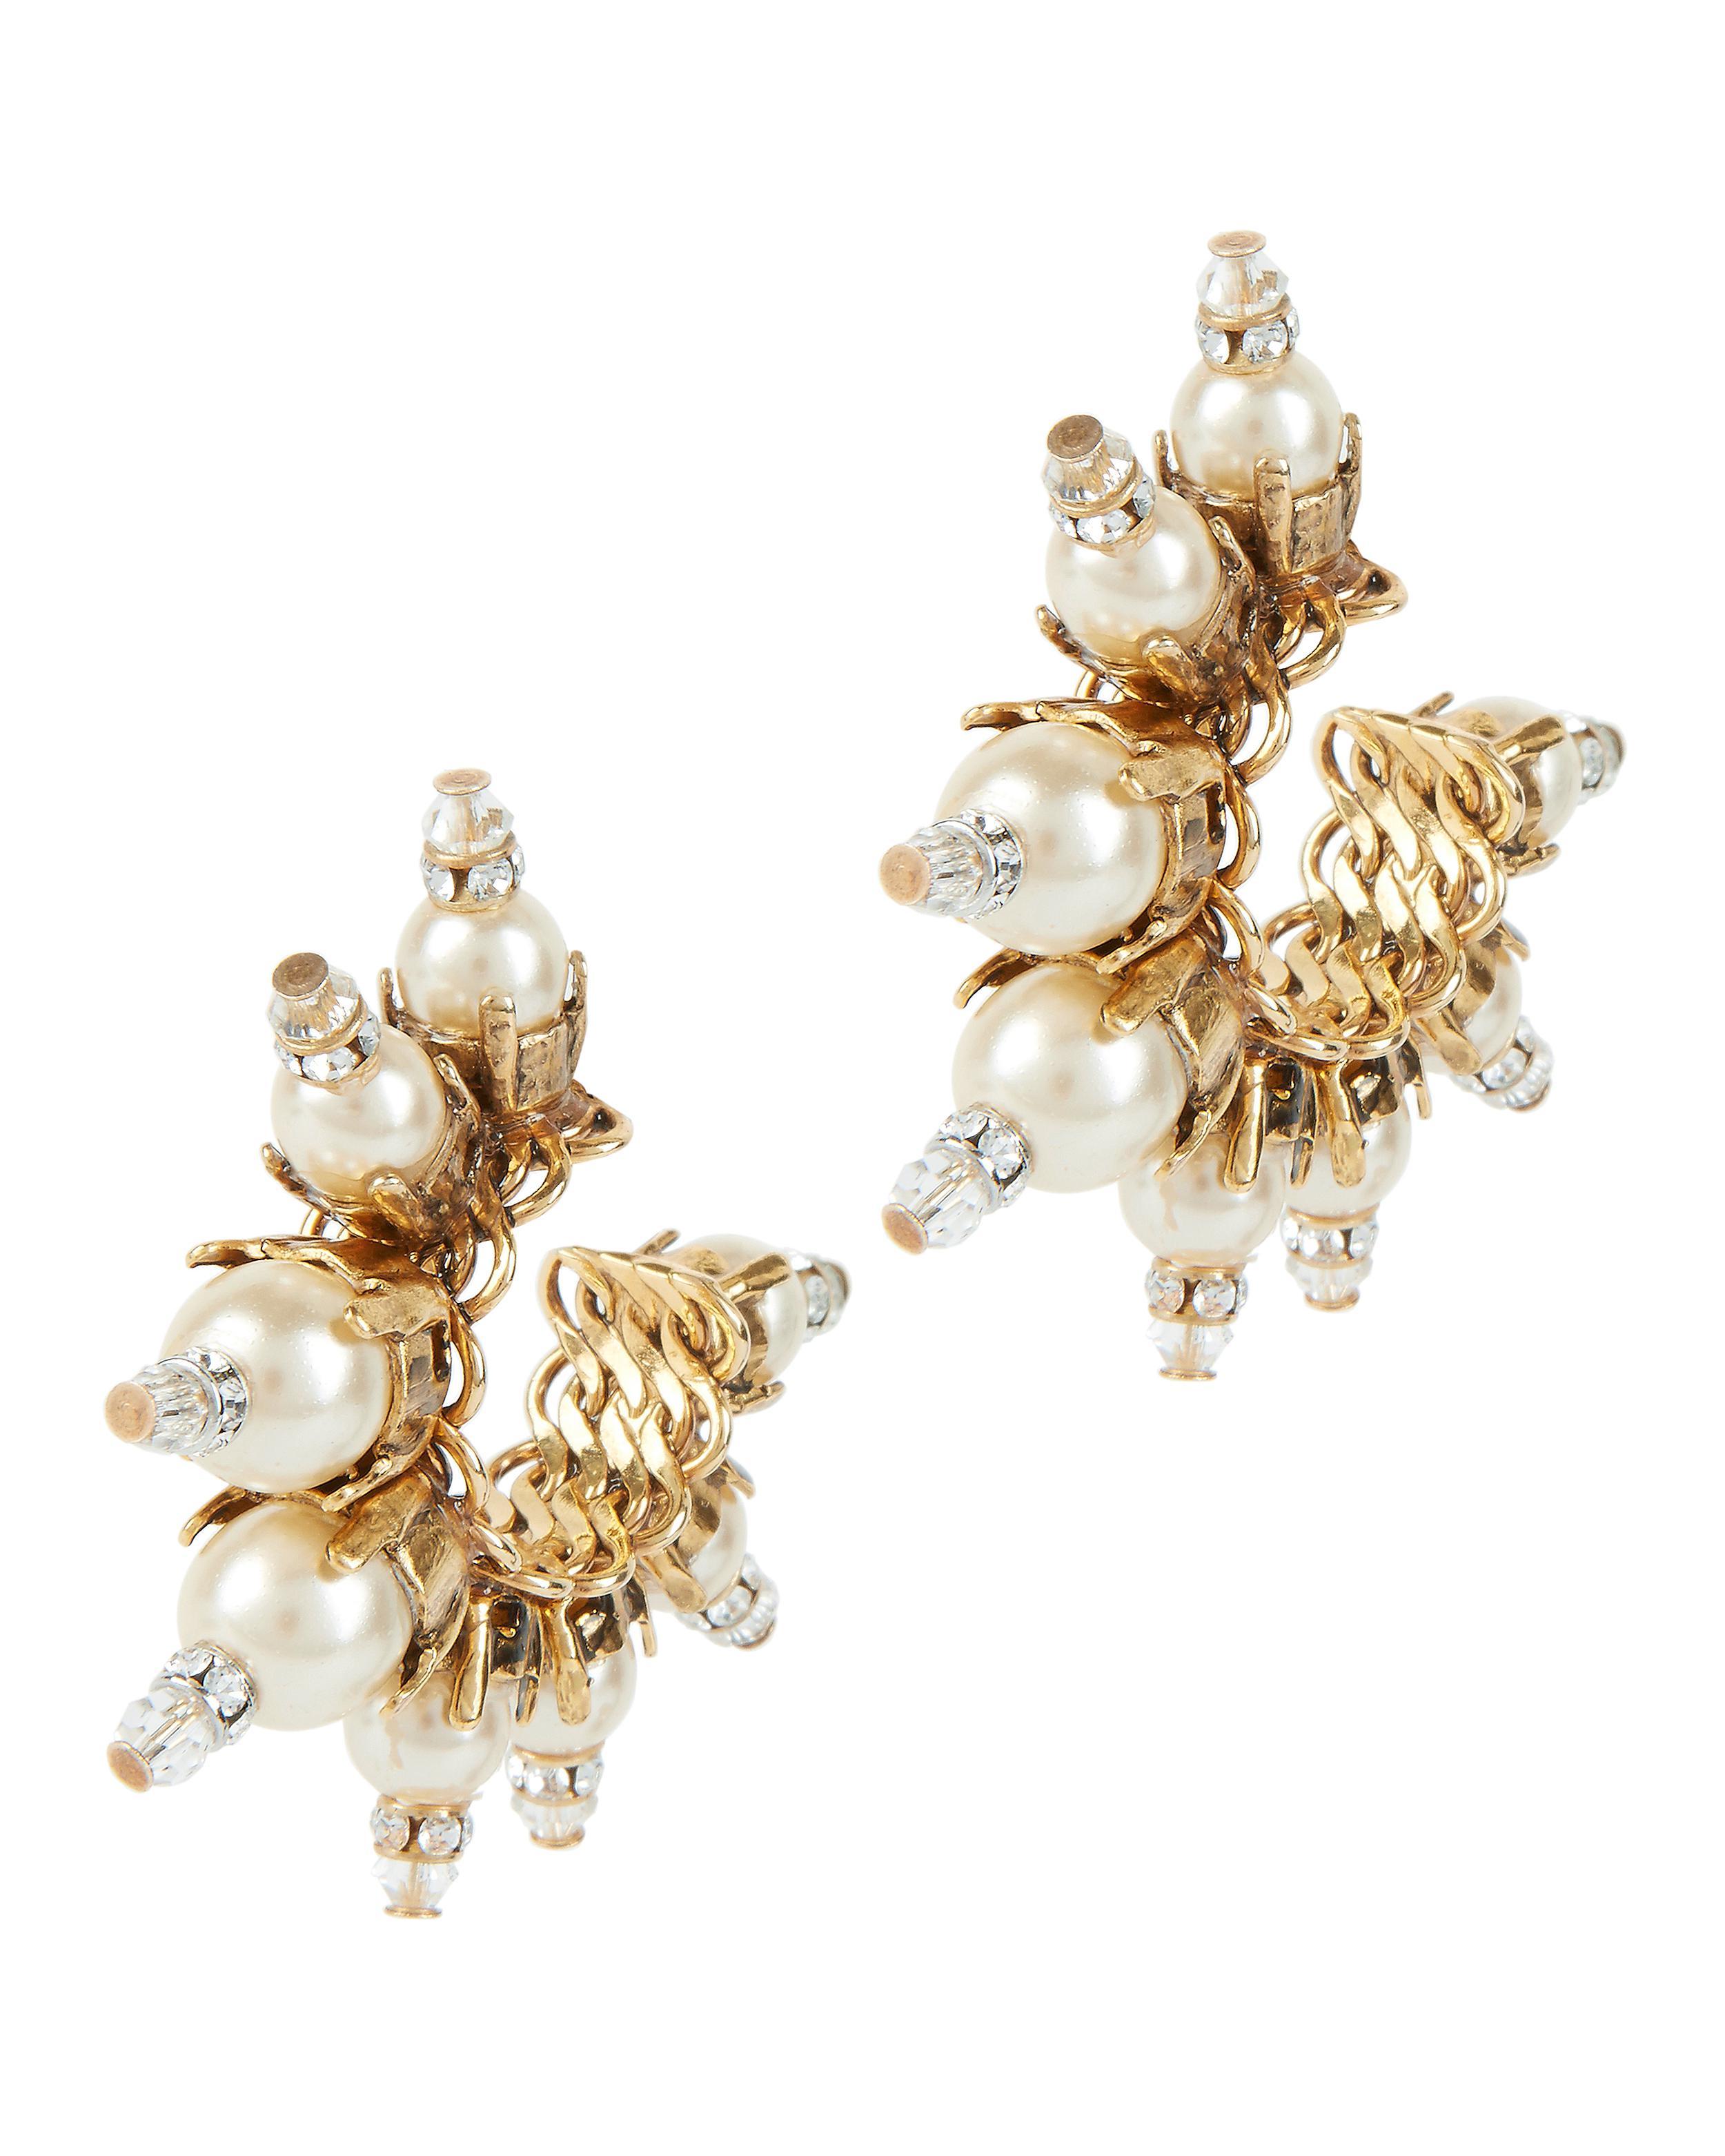 Gold-Plated Pearl Embellished Hoop Earrings Erickson Beamon blIkuFr